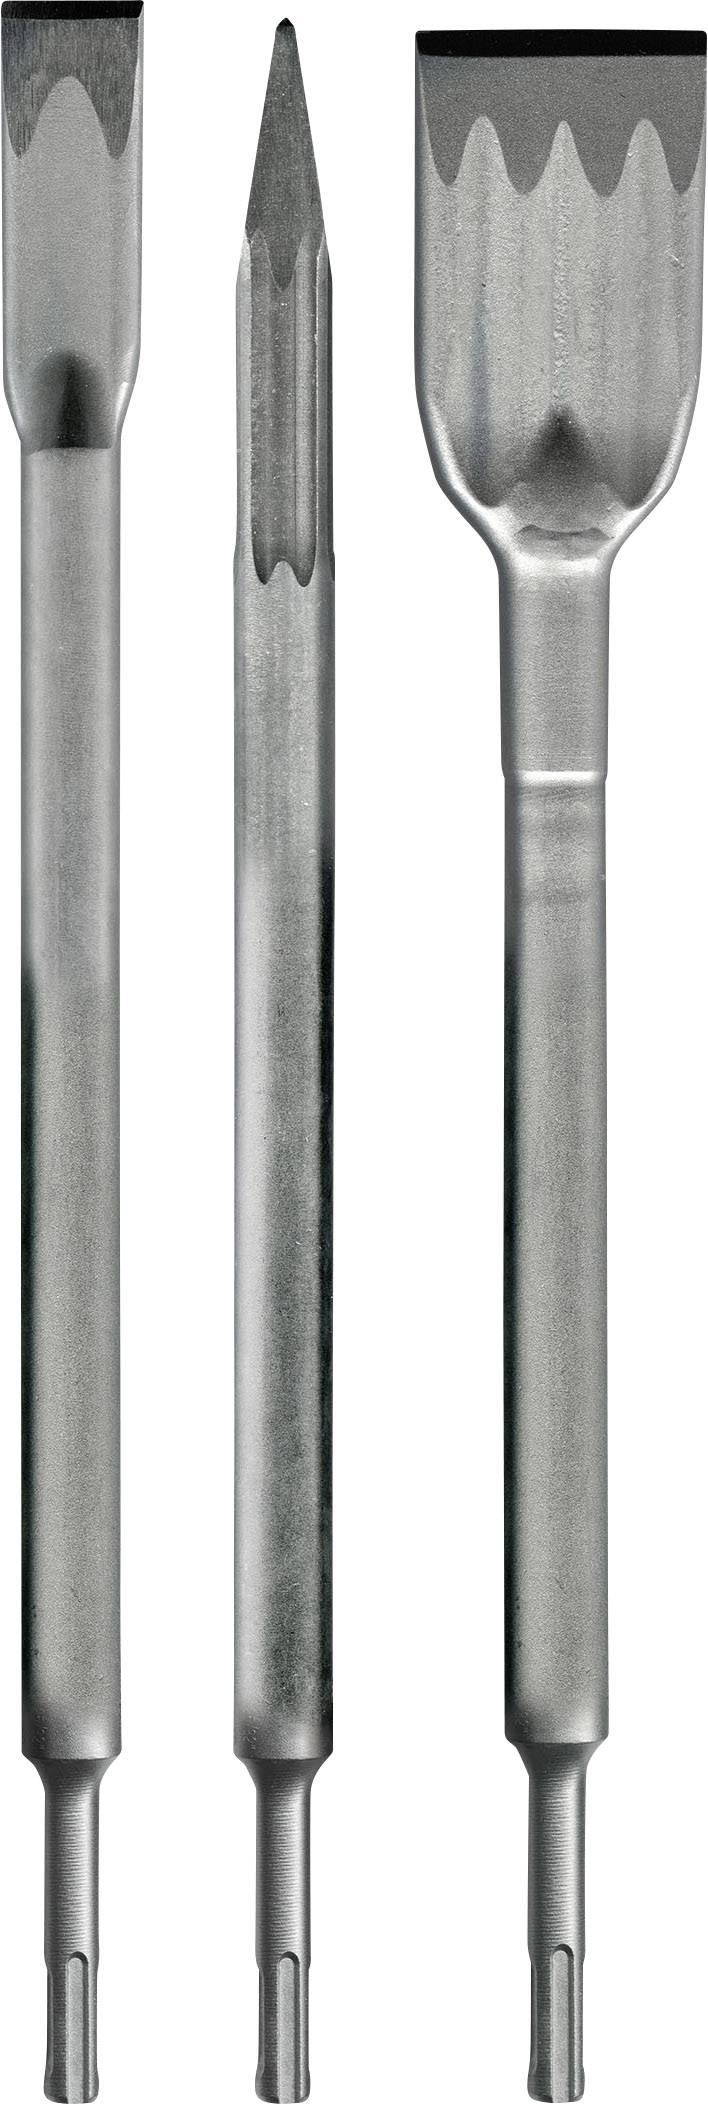 Heller SDS-Plus Enduro Flat Chisel Bit 20mm x 250mm High Quality Long Life Tool